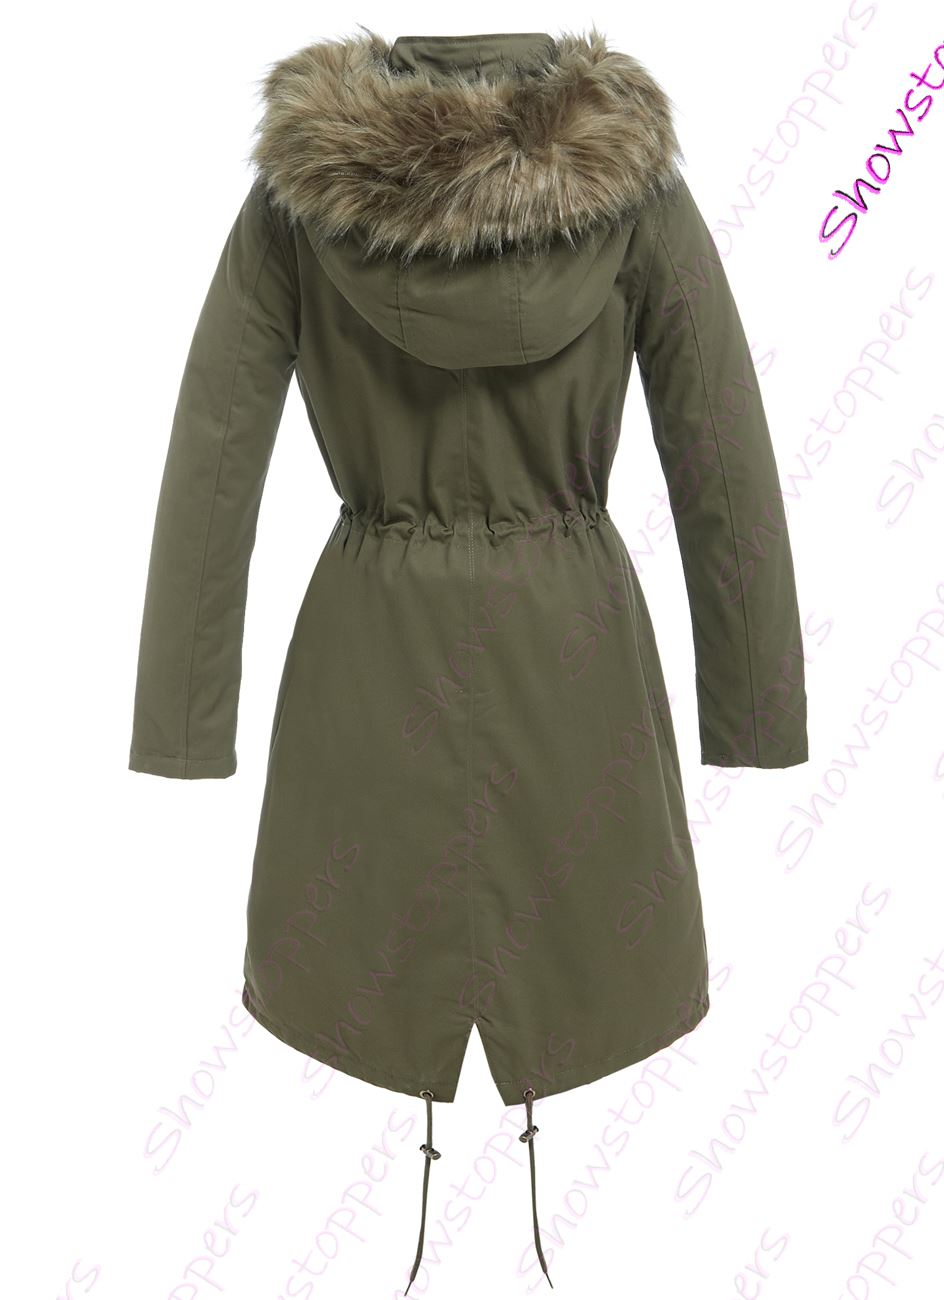 WOMENS Faux Fur PARKA PARKA PARKA FLEECE LINED LONG COAT Size 8 10 12 14 16 Fishtail Khaki 481e57